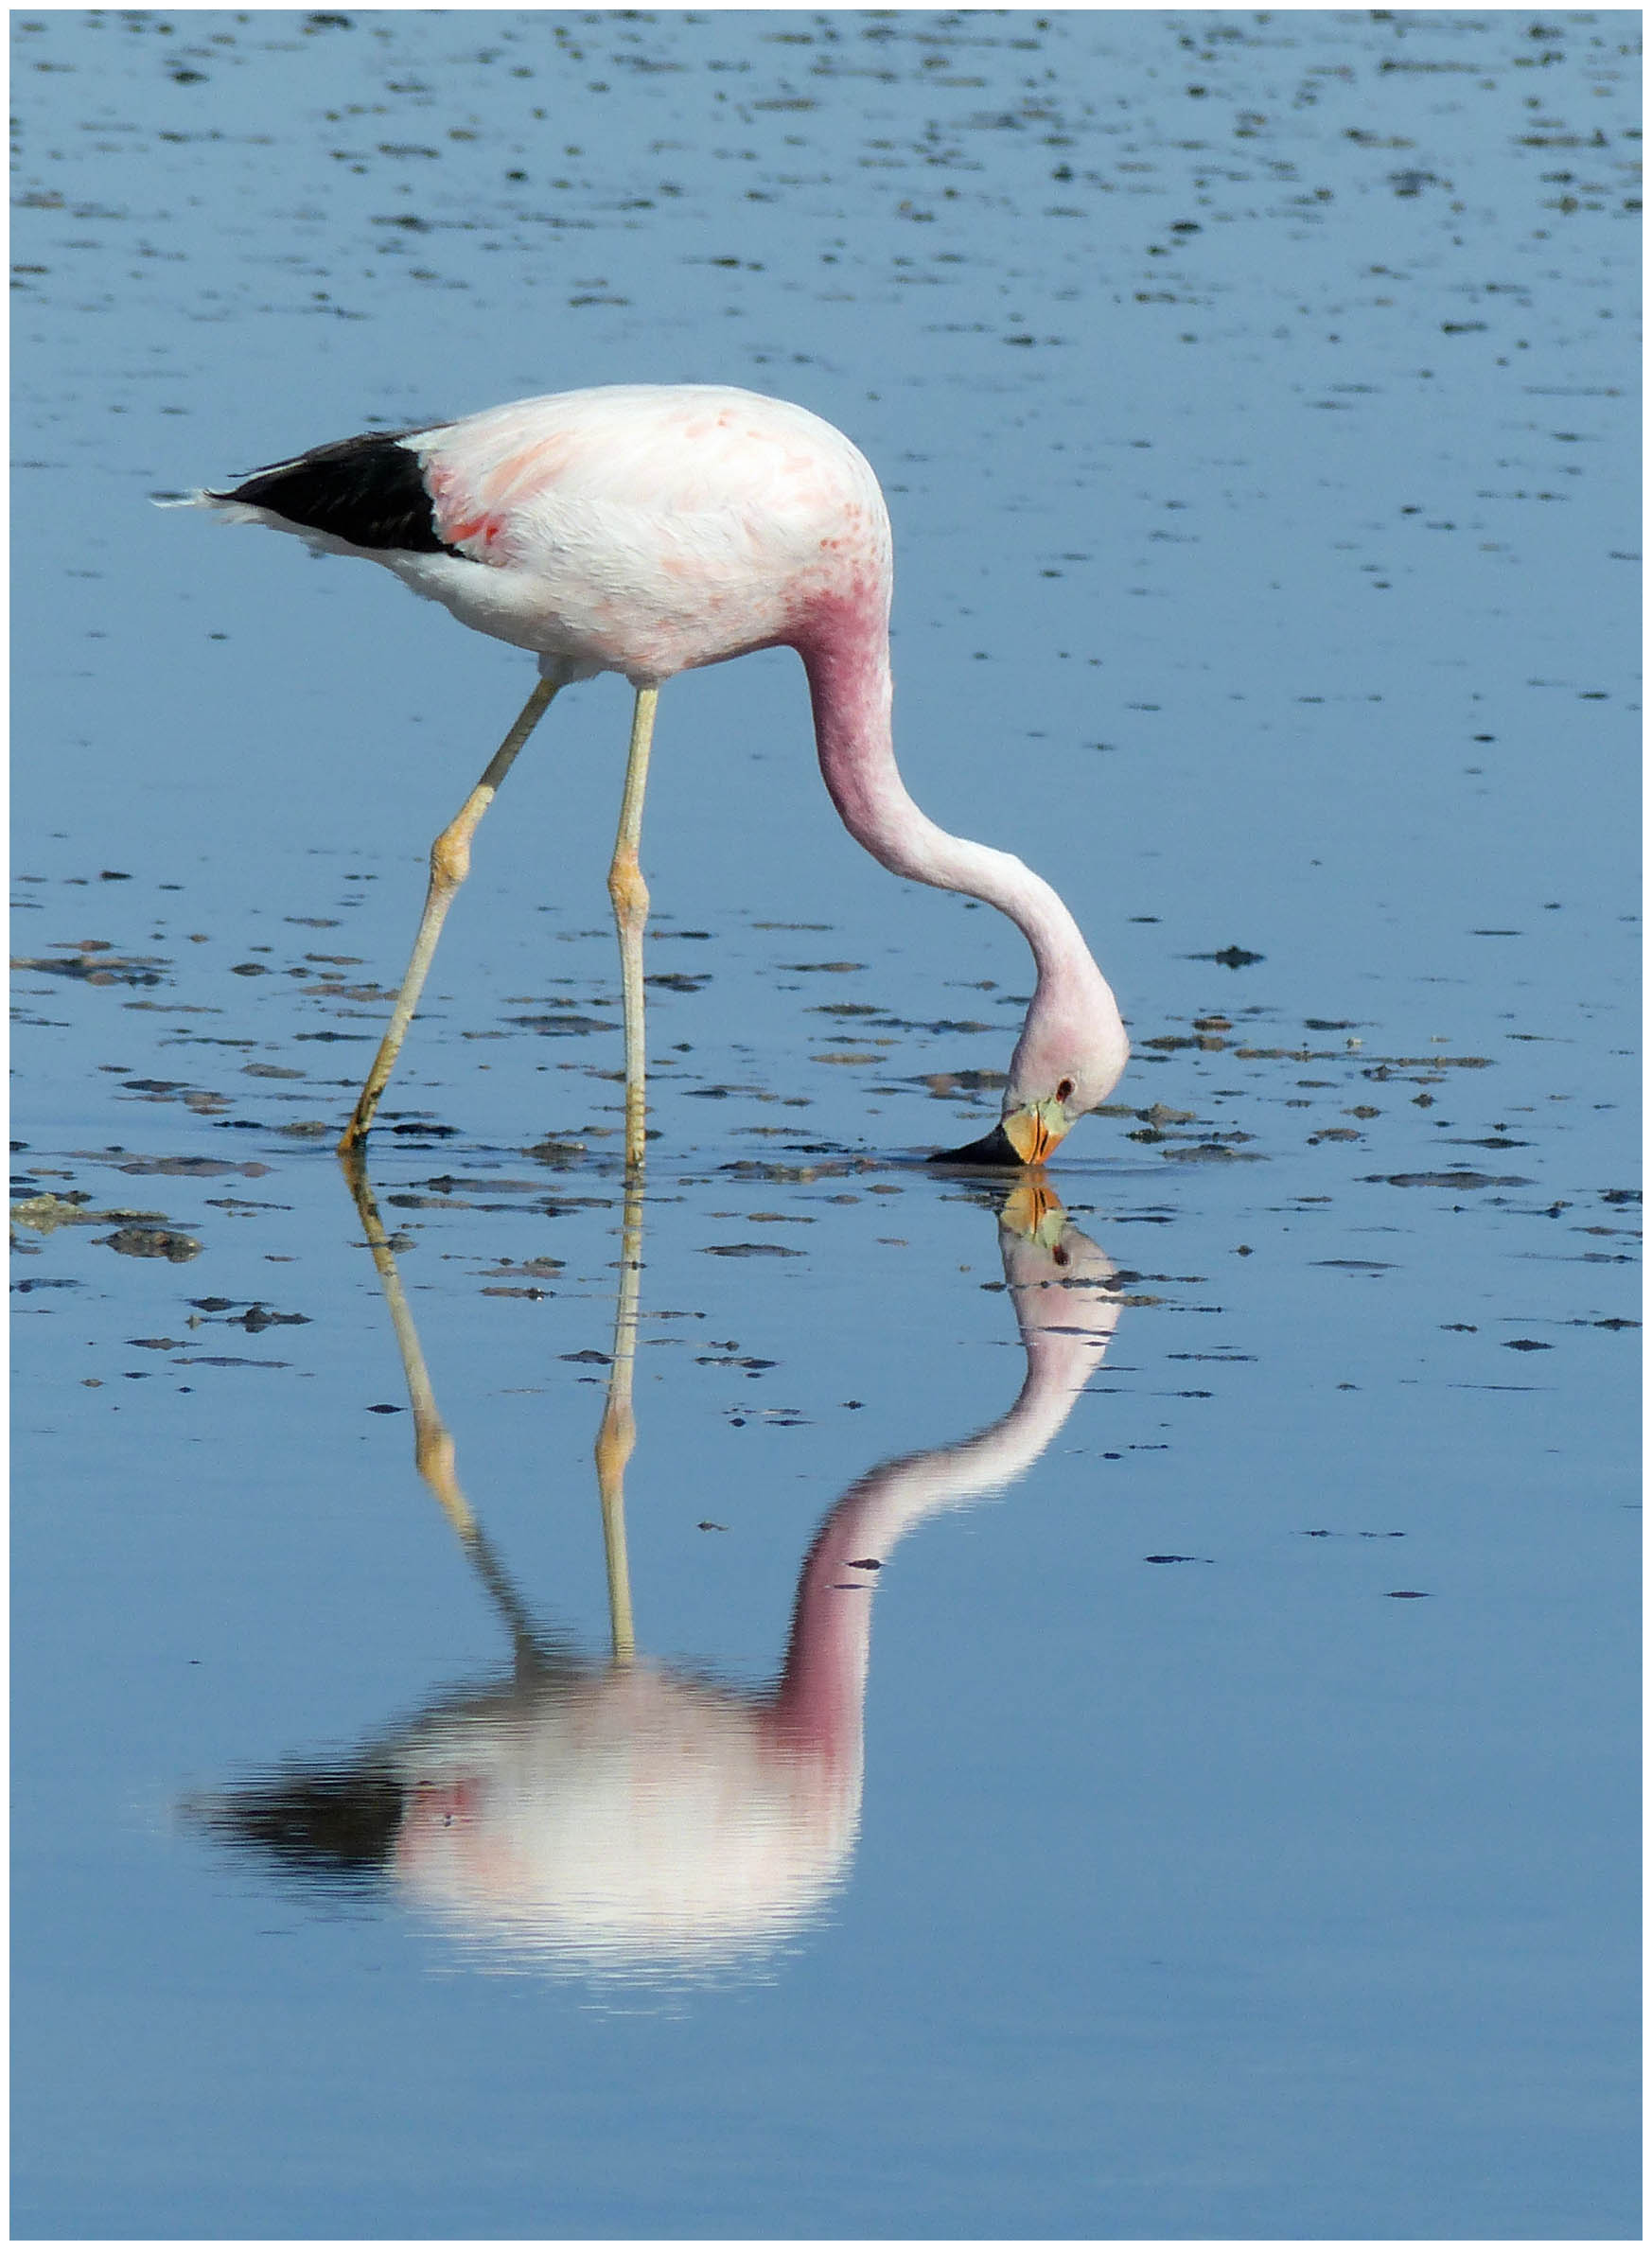 Flamingo feeding in blue water